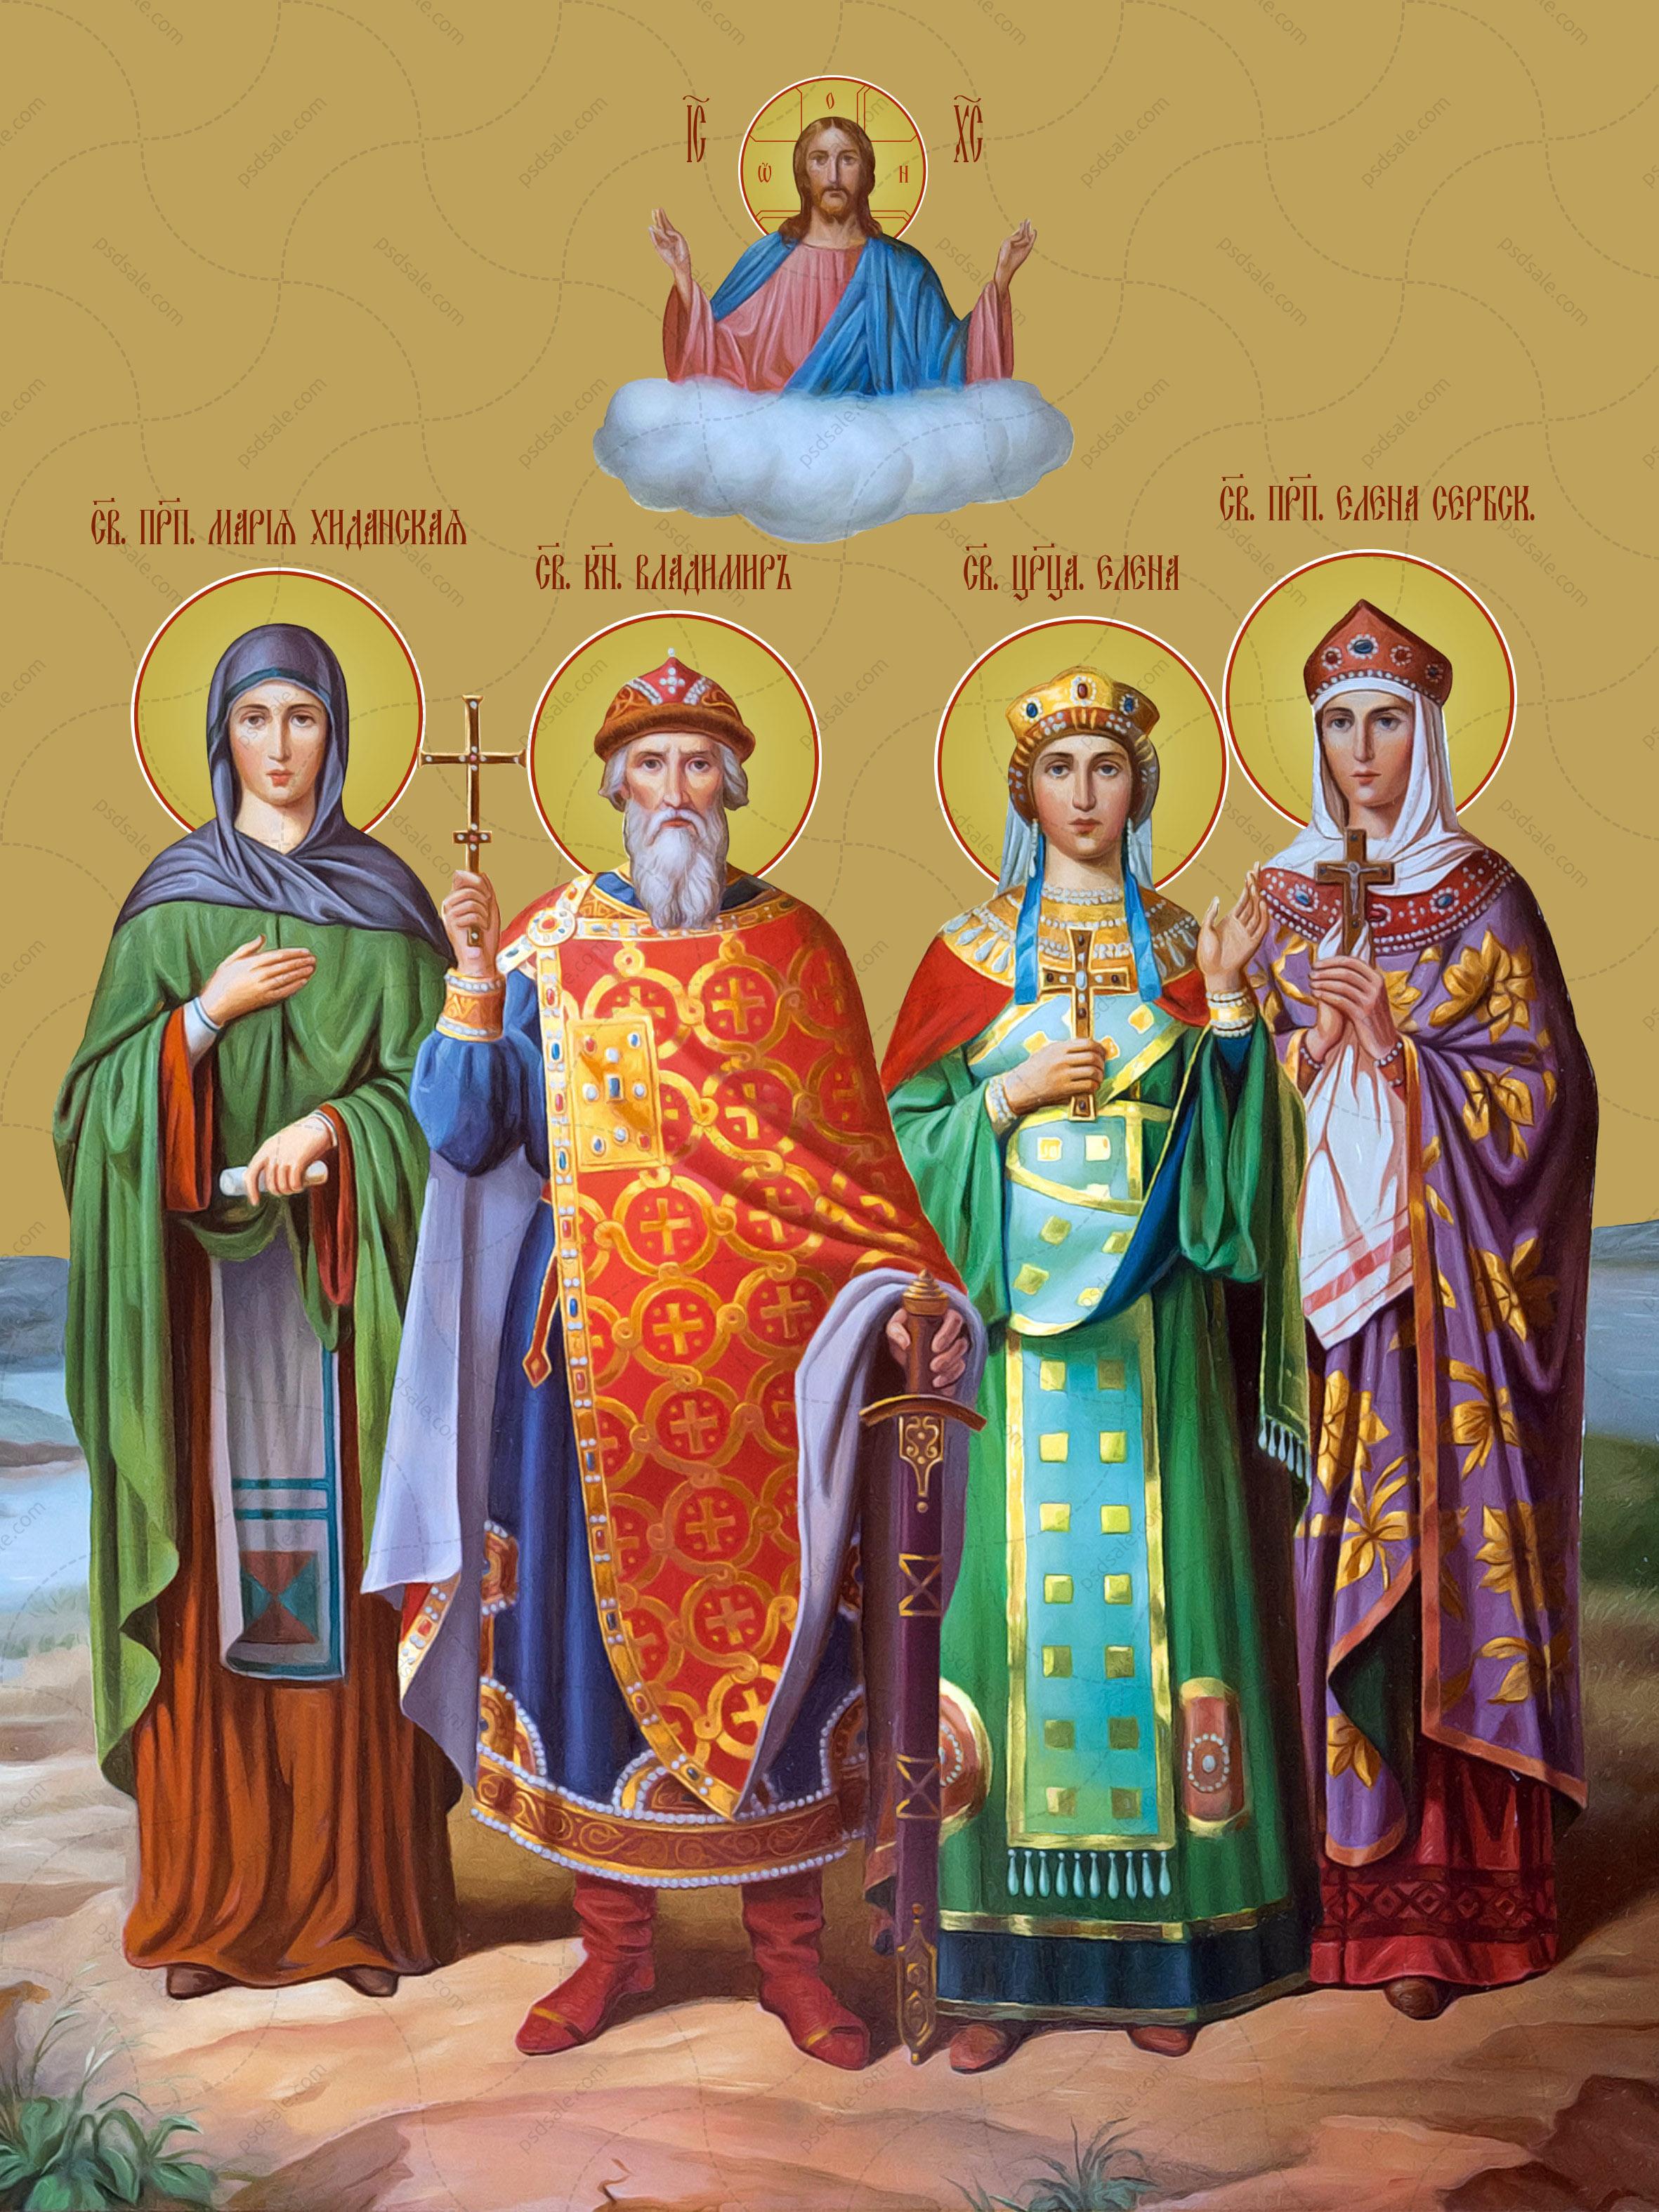 Мария, князь Владимир, царица Елена, Елена Сербская